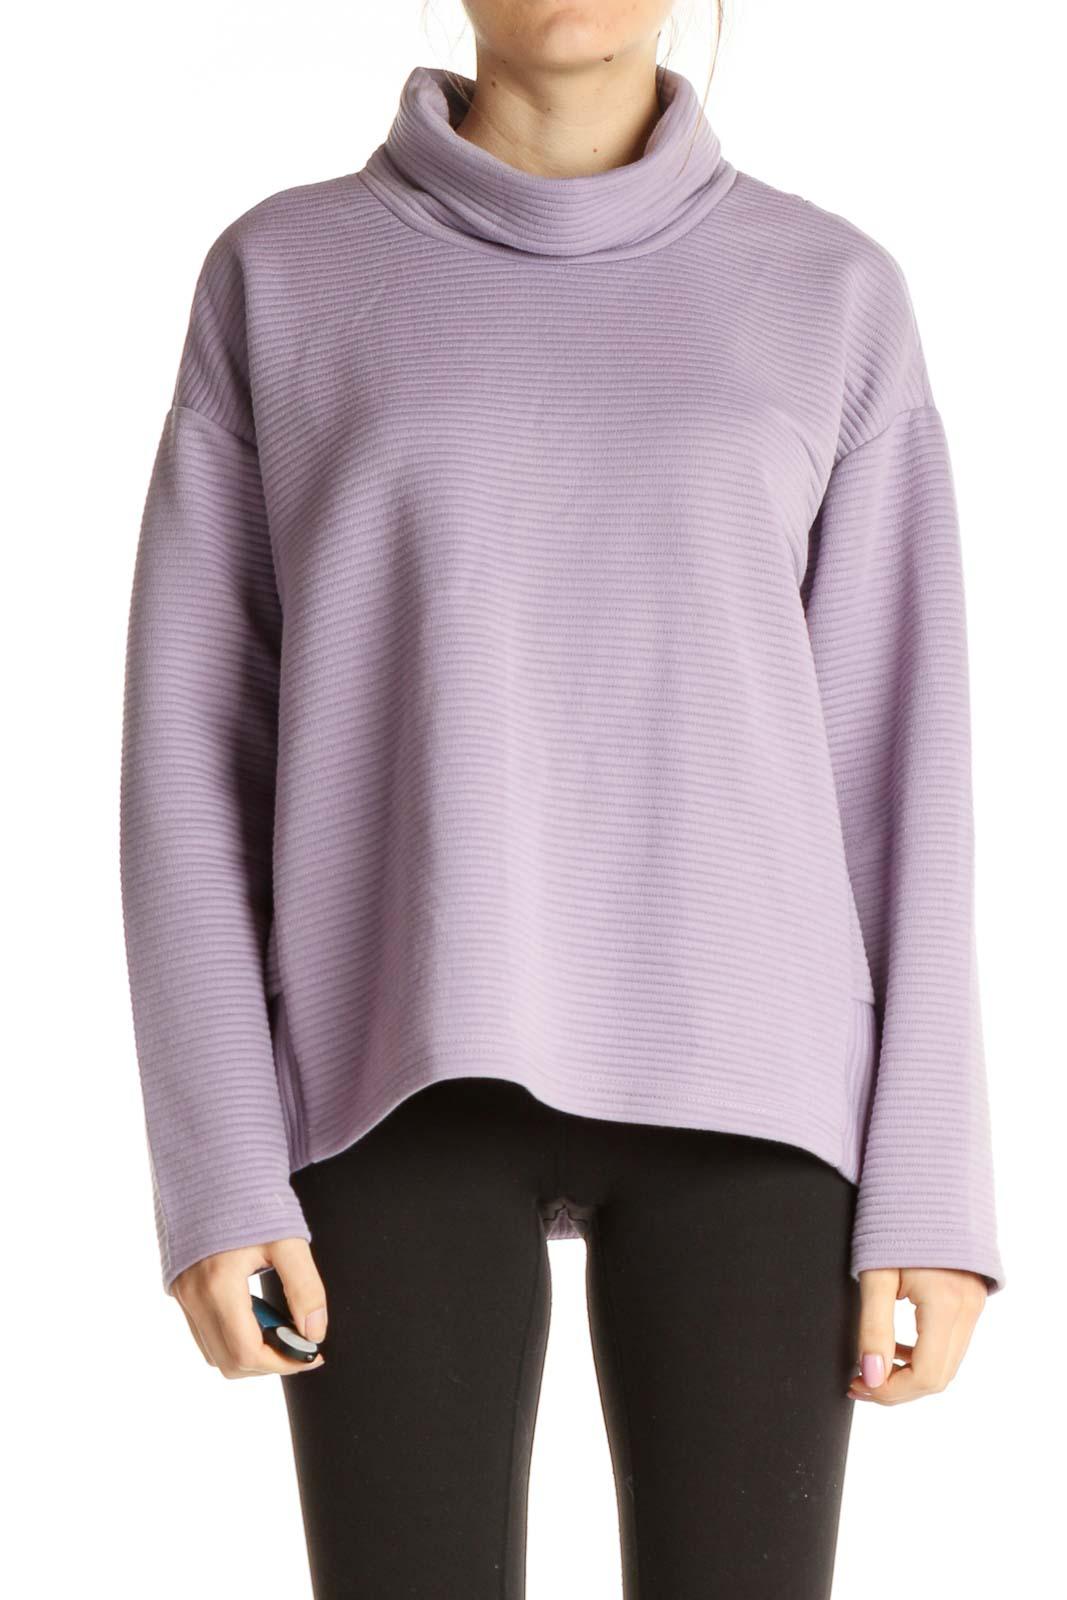 Purple Sweatshirt Front